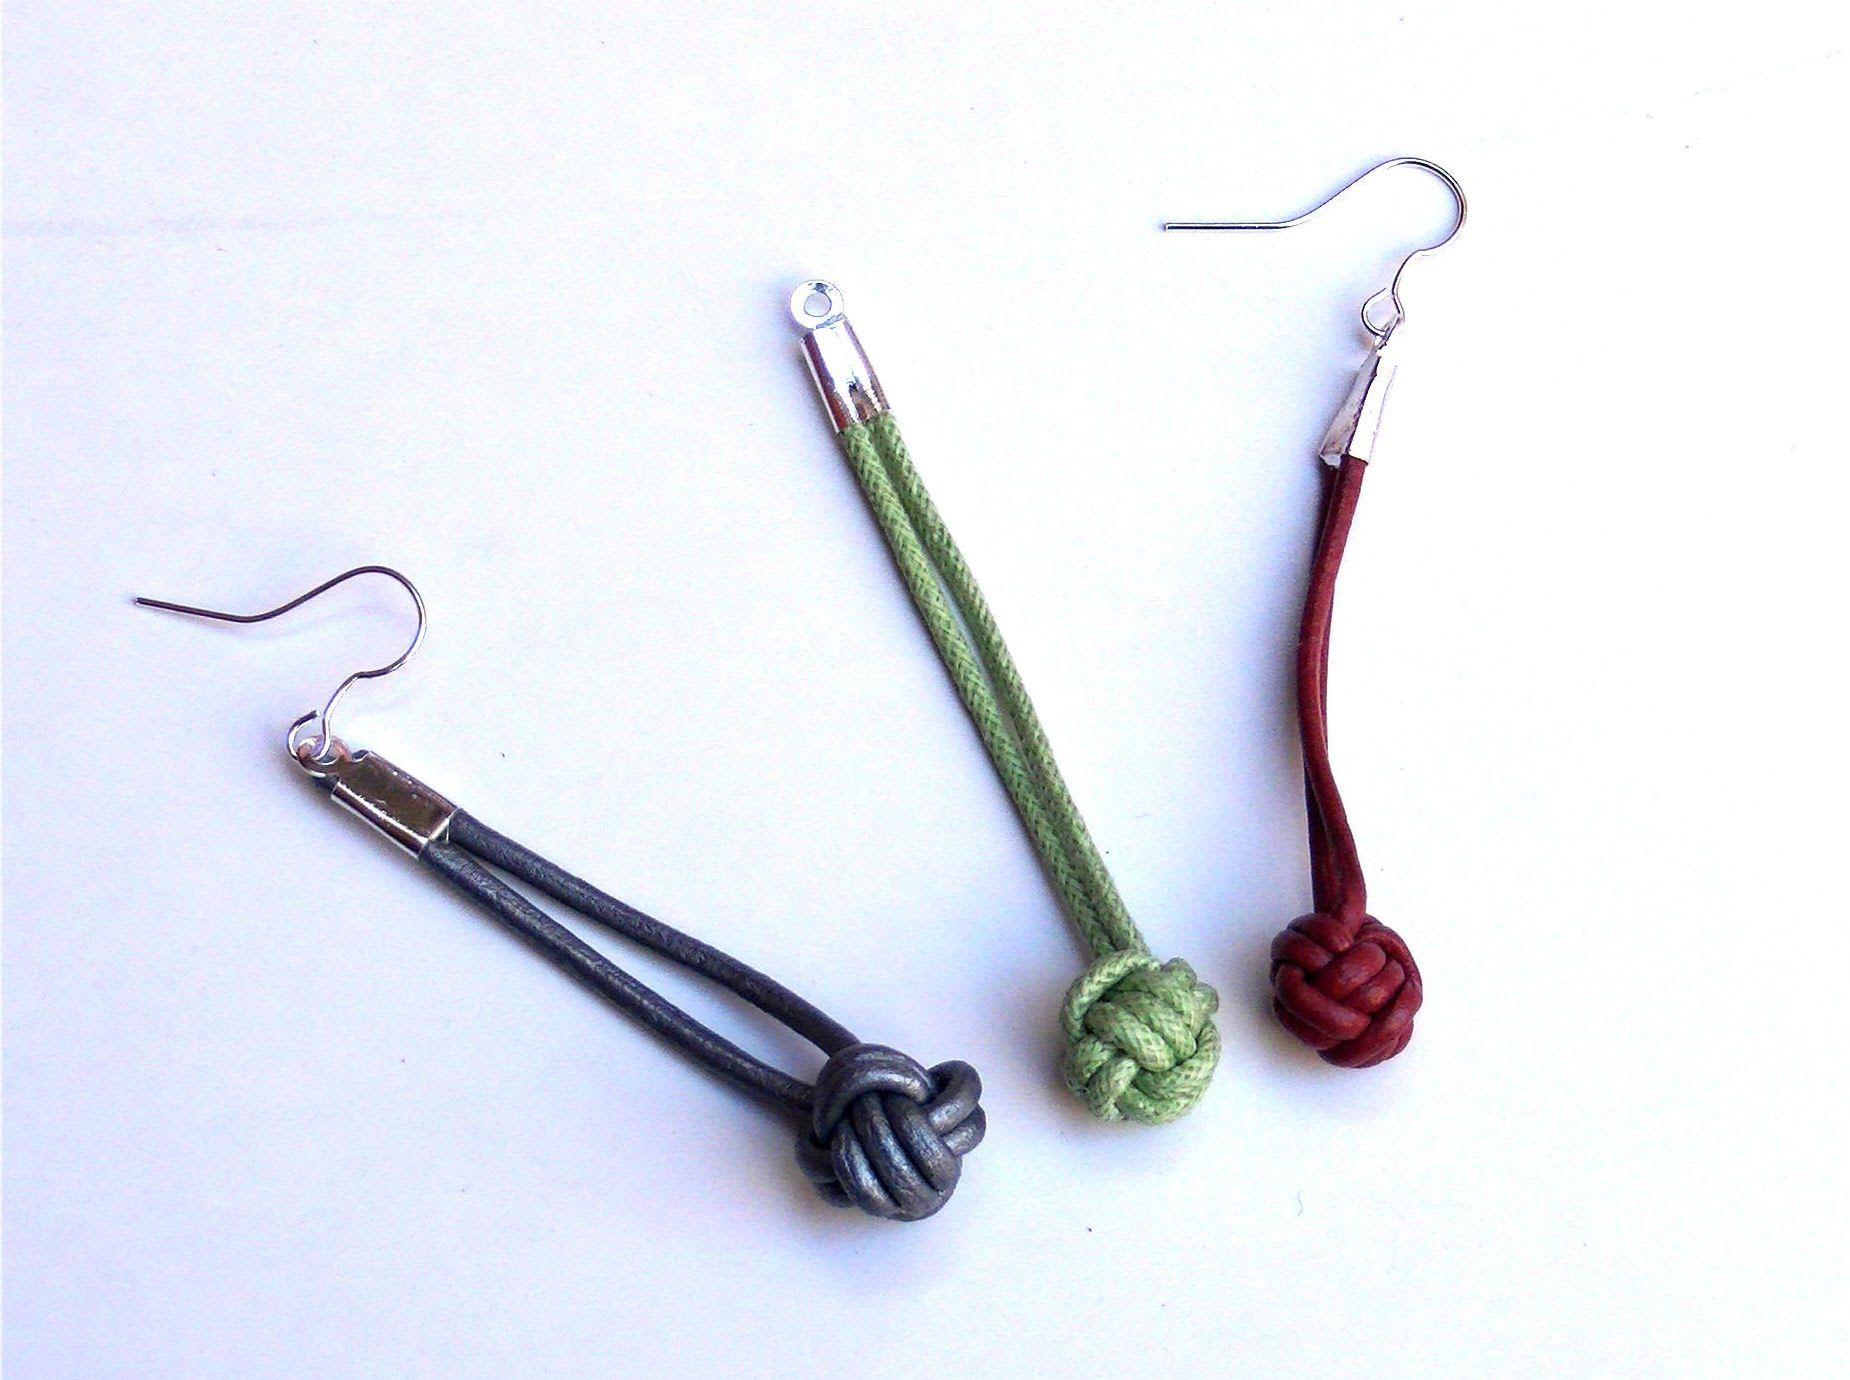 Beading Ideas - How to make the manrope knot, via YouTube.